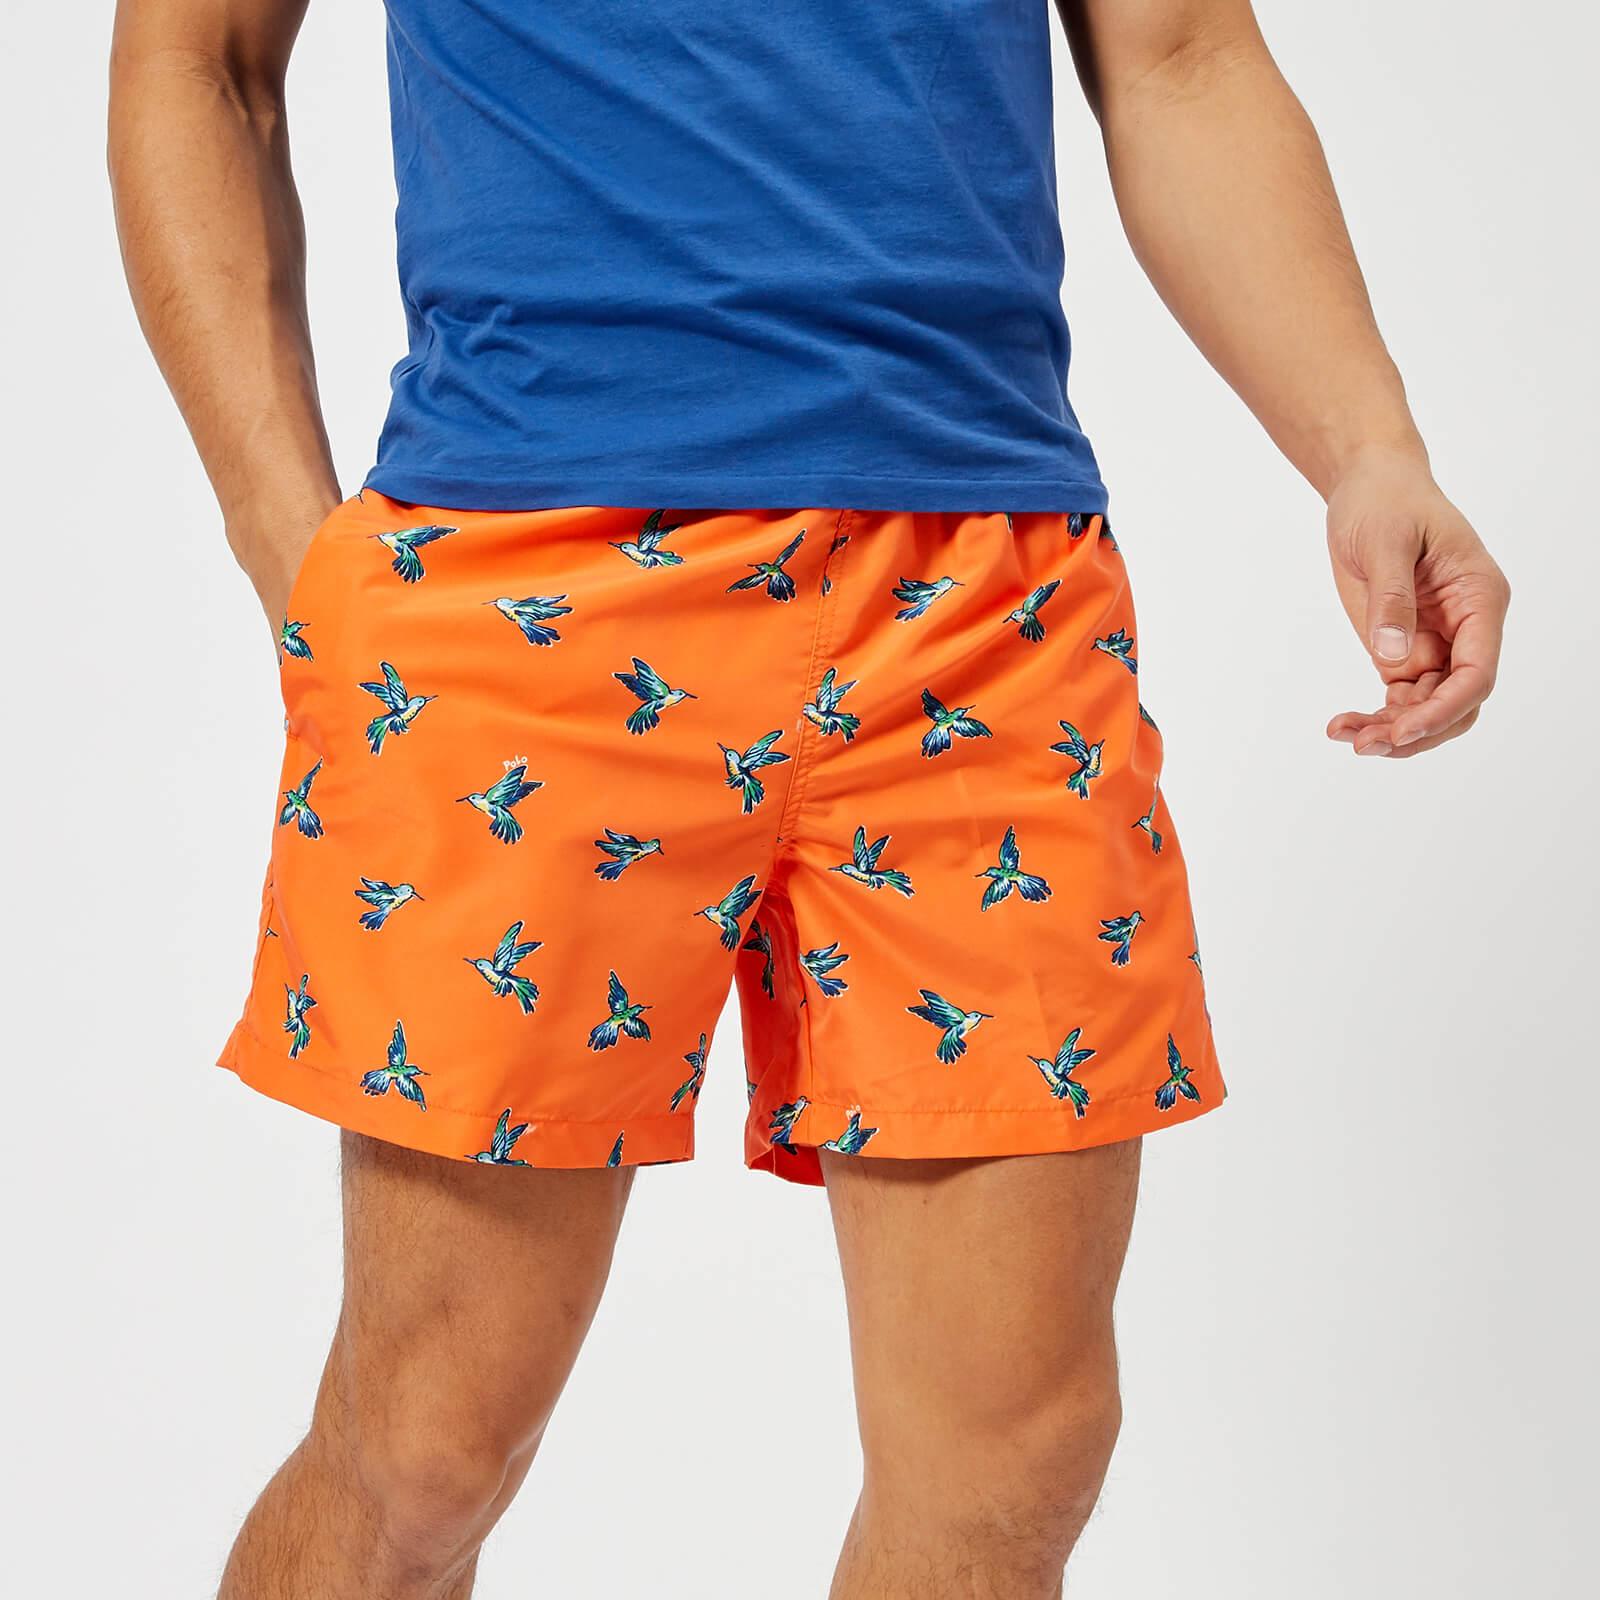 86feb044d37bd Polo Ralph Lauren Men's Traveller Swim Shorts - Hummingbird - Free UK  Delivery over £50